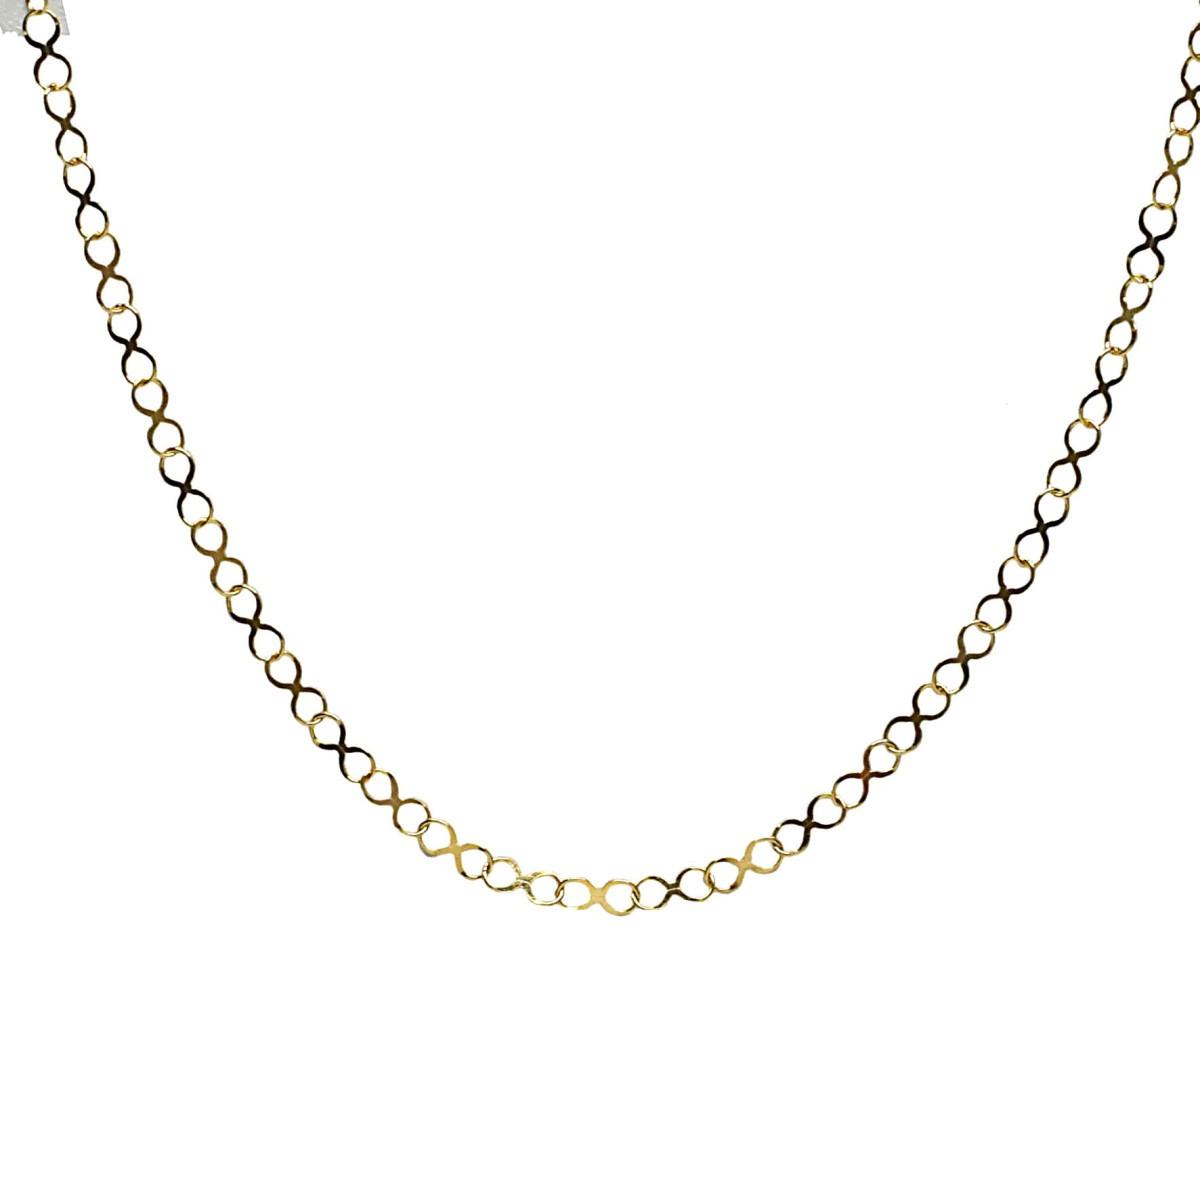 K18 18金 インフィニティ デザインネックレス 約2.0g 45cm